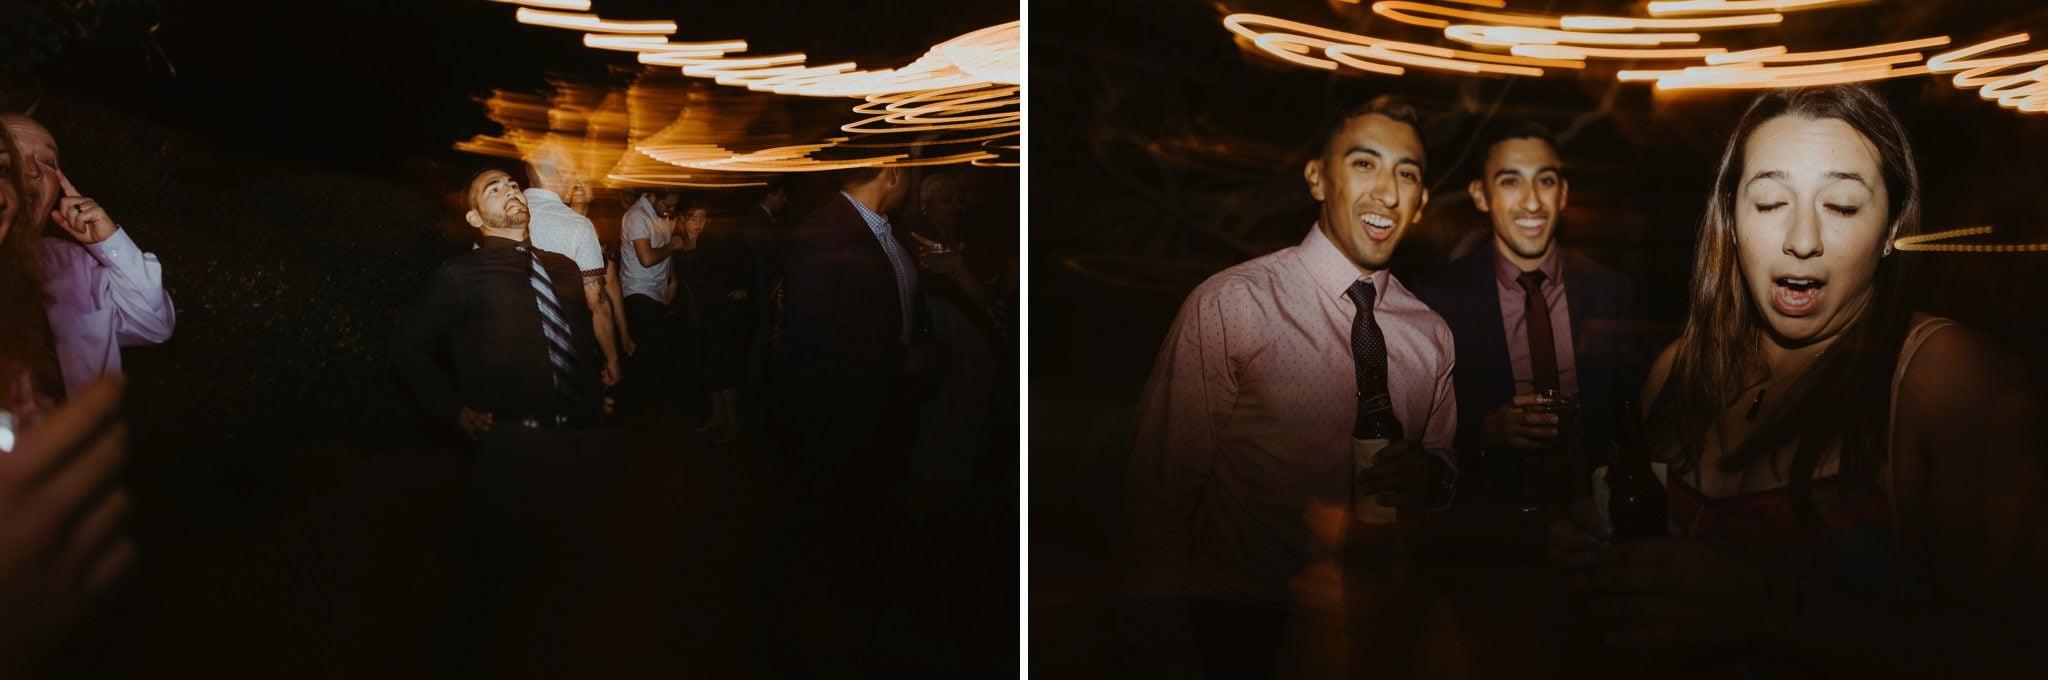 simi valley wedding photography 185